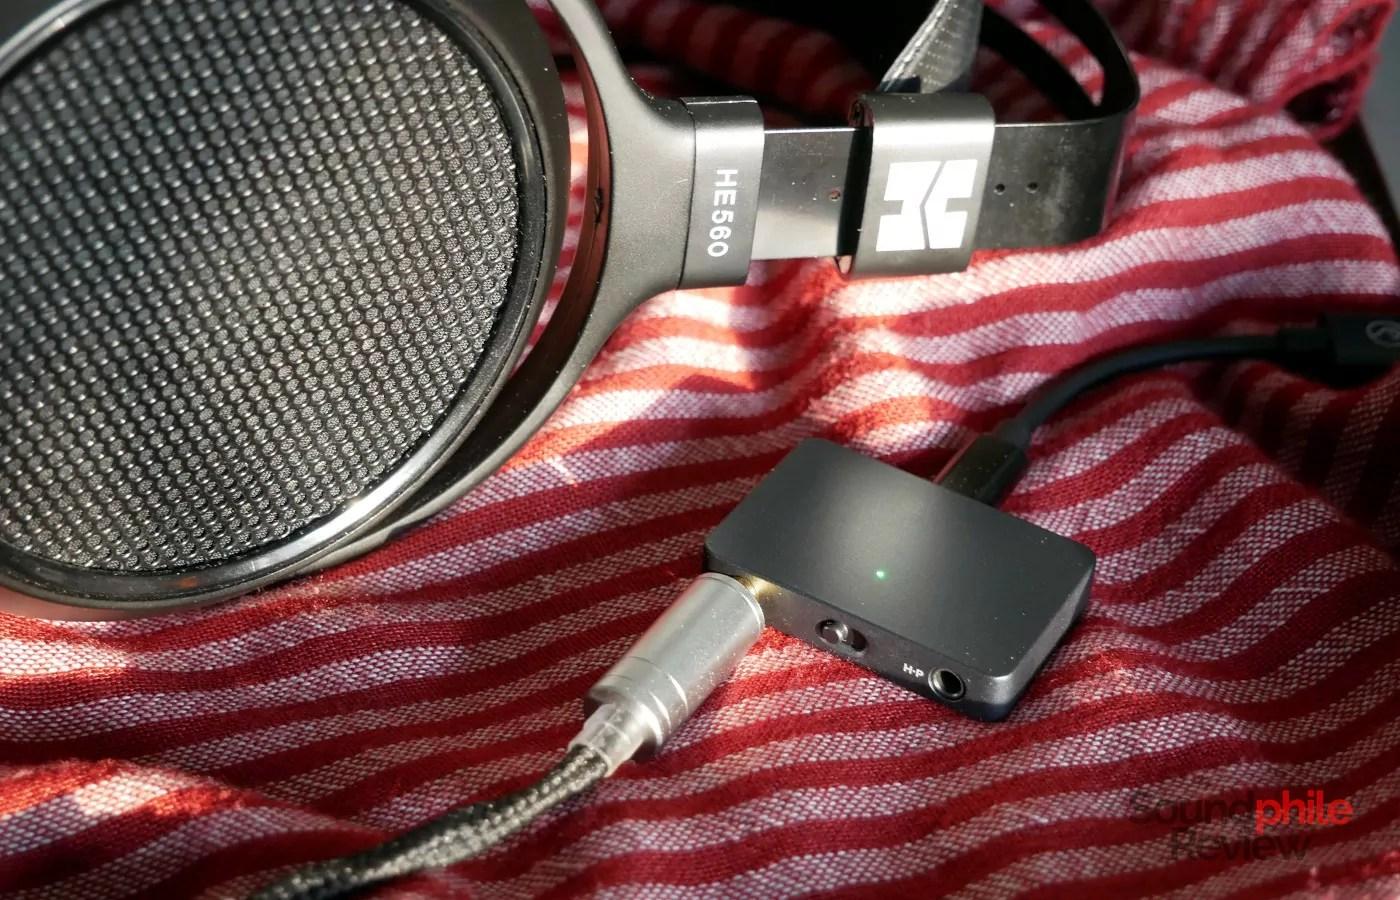 EarStudio HUD100 review